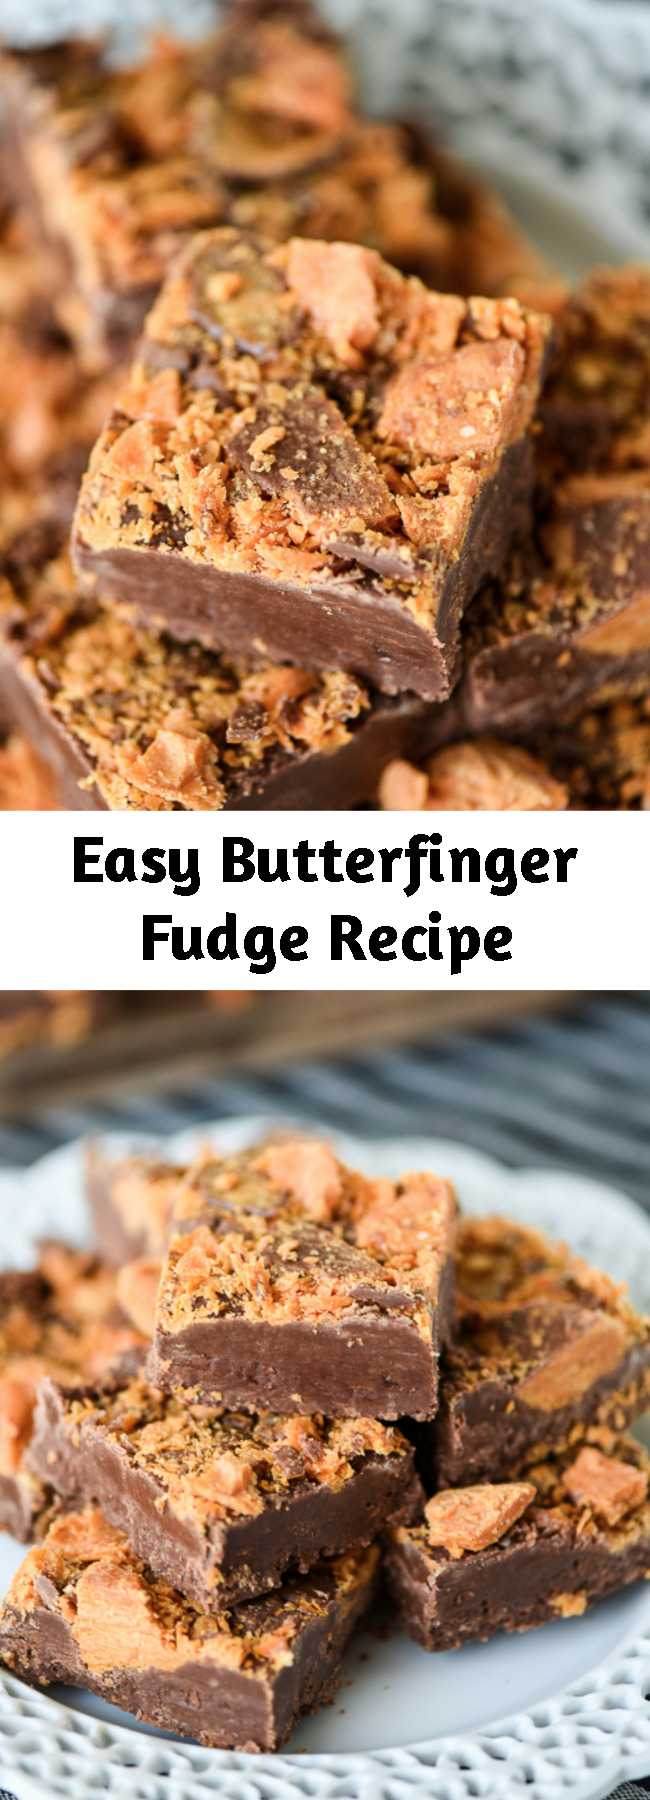 Easy Butterfinger Fudge Recipe - Easy chocolate fudge recipe topped with Butterfinger candy.